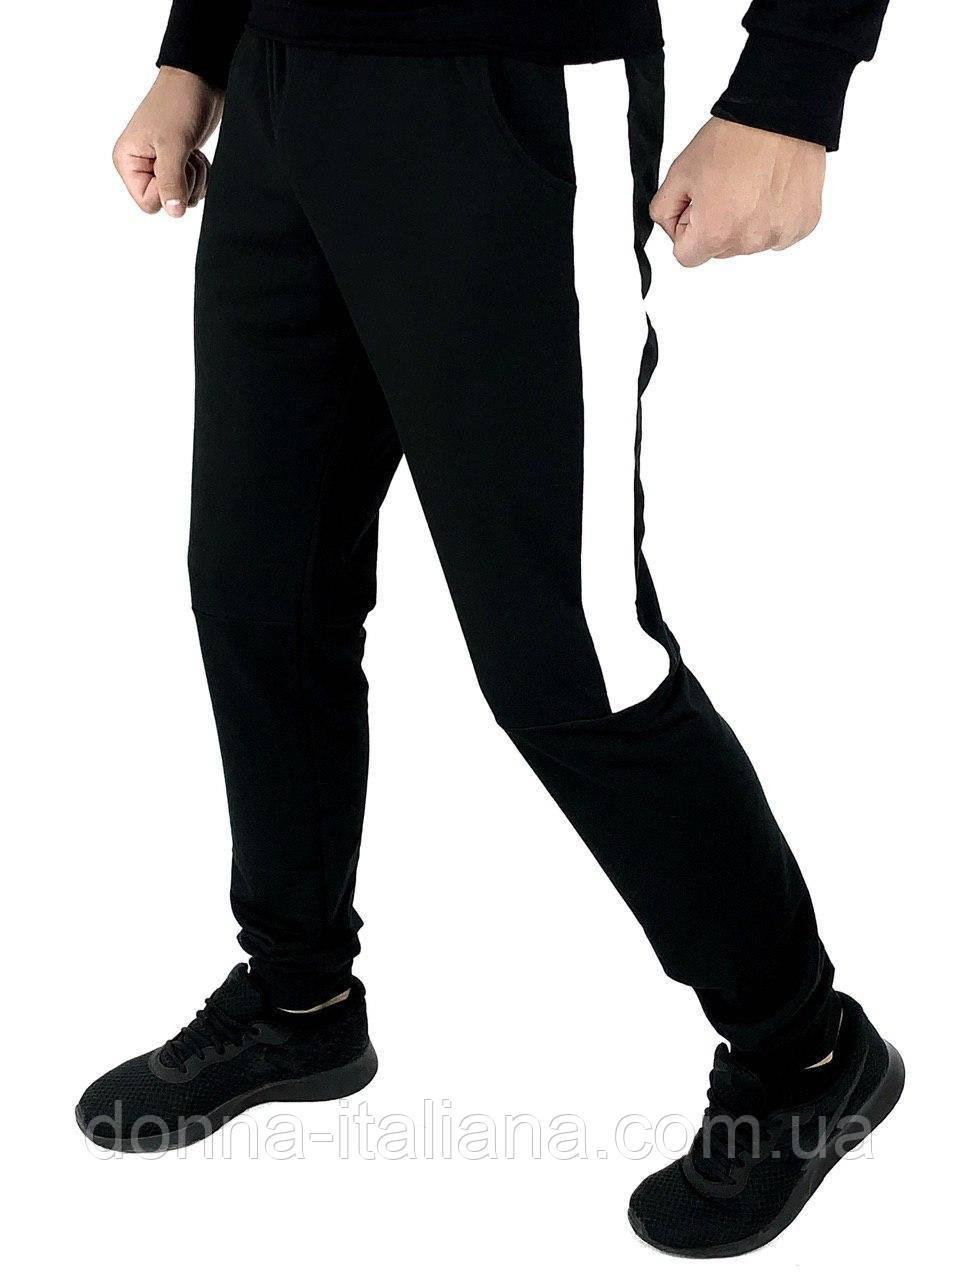 Штани Intruder Spirited XL Чорний з білим (1590228387/ 5)